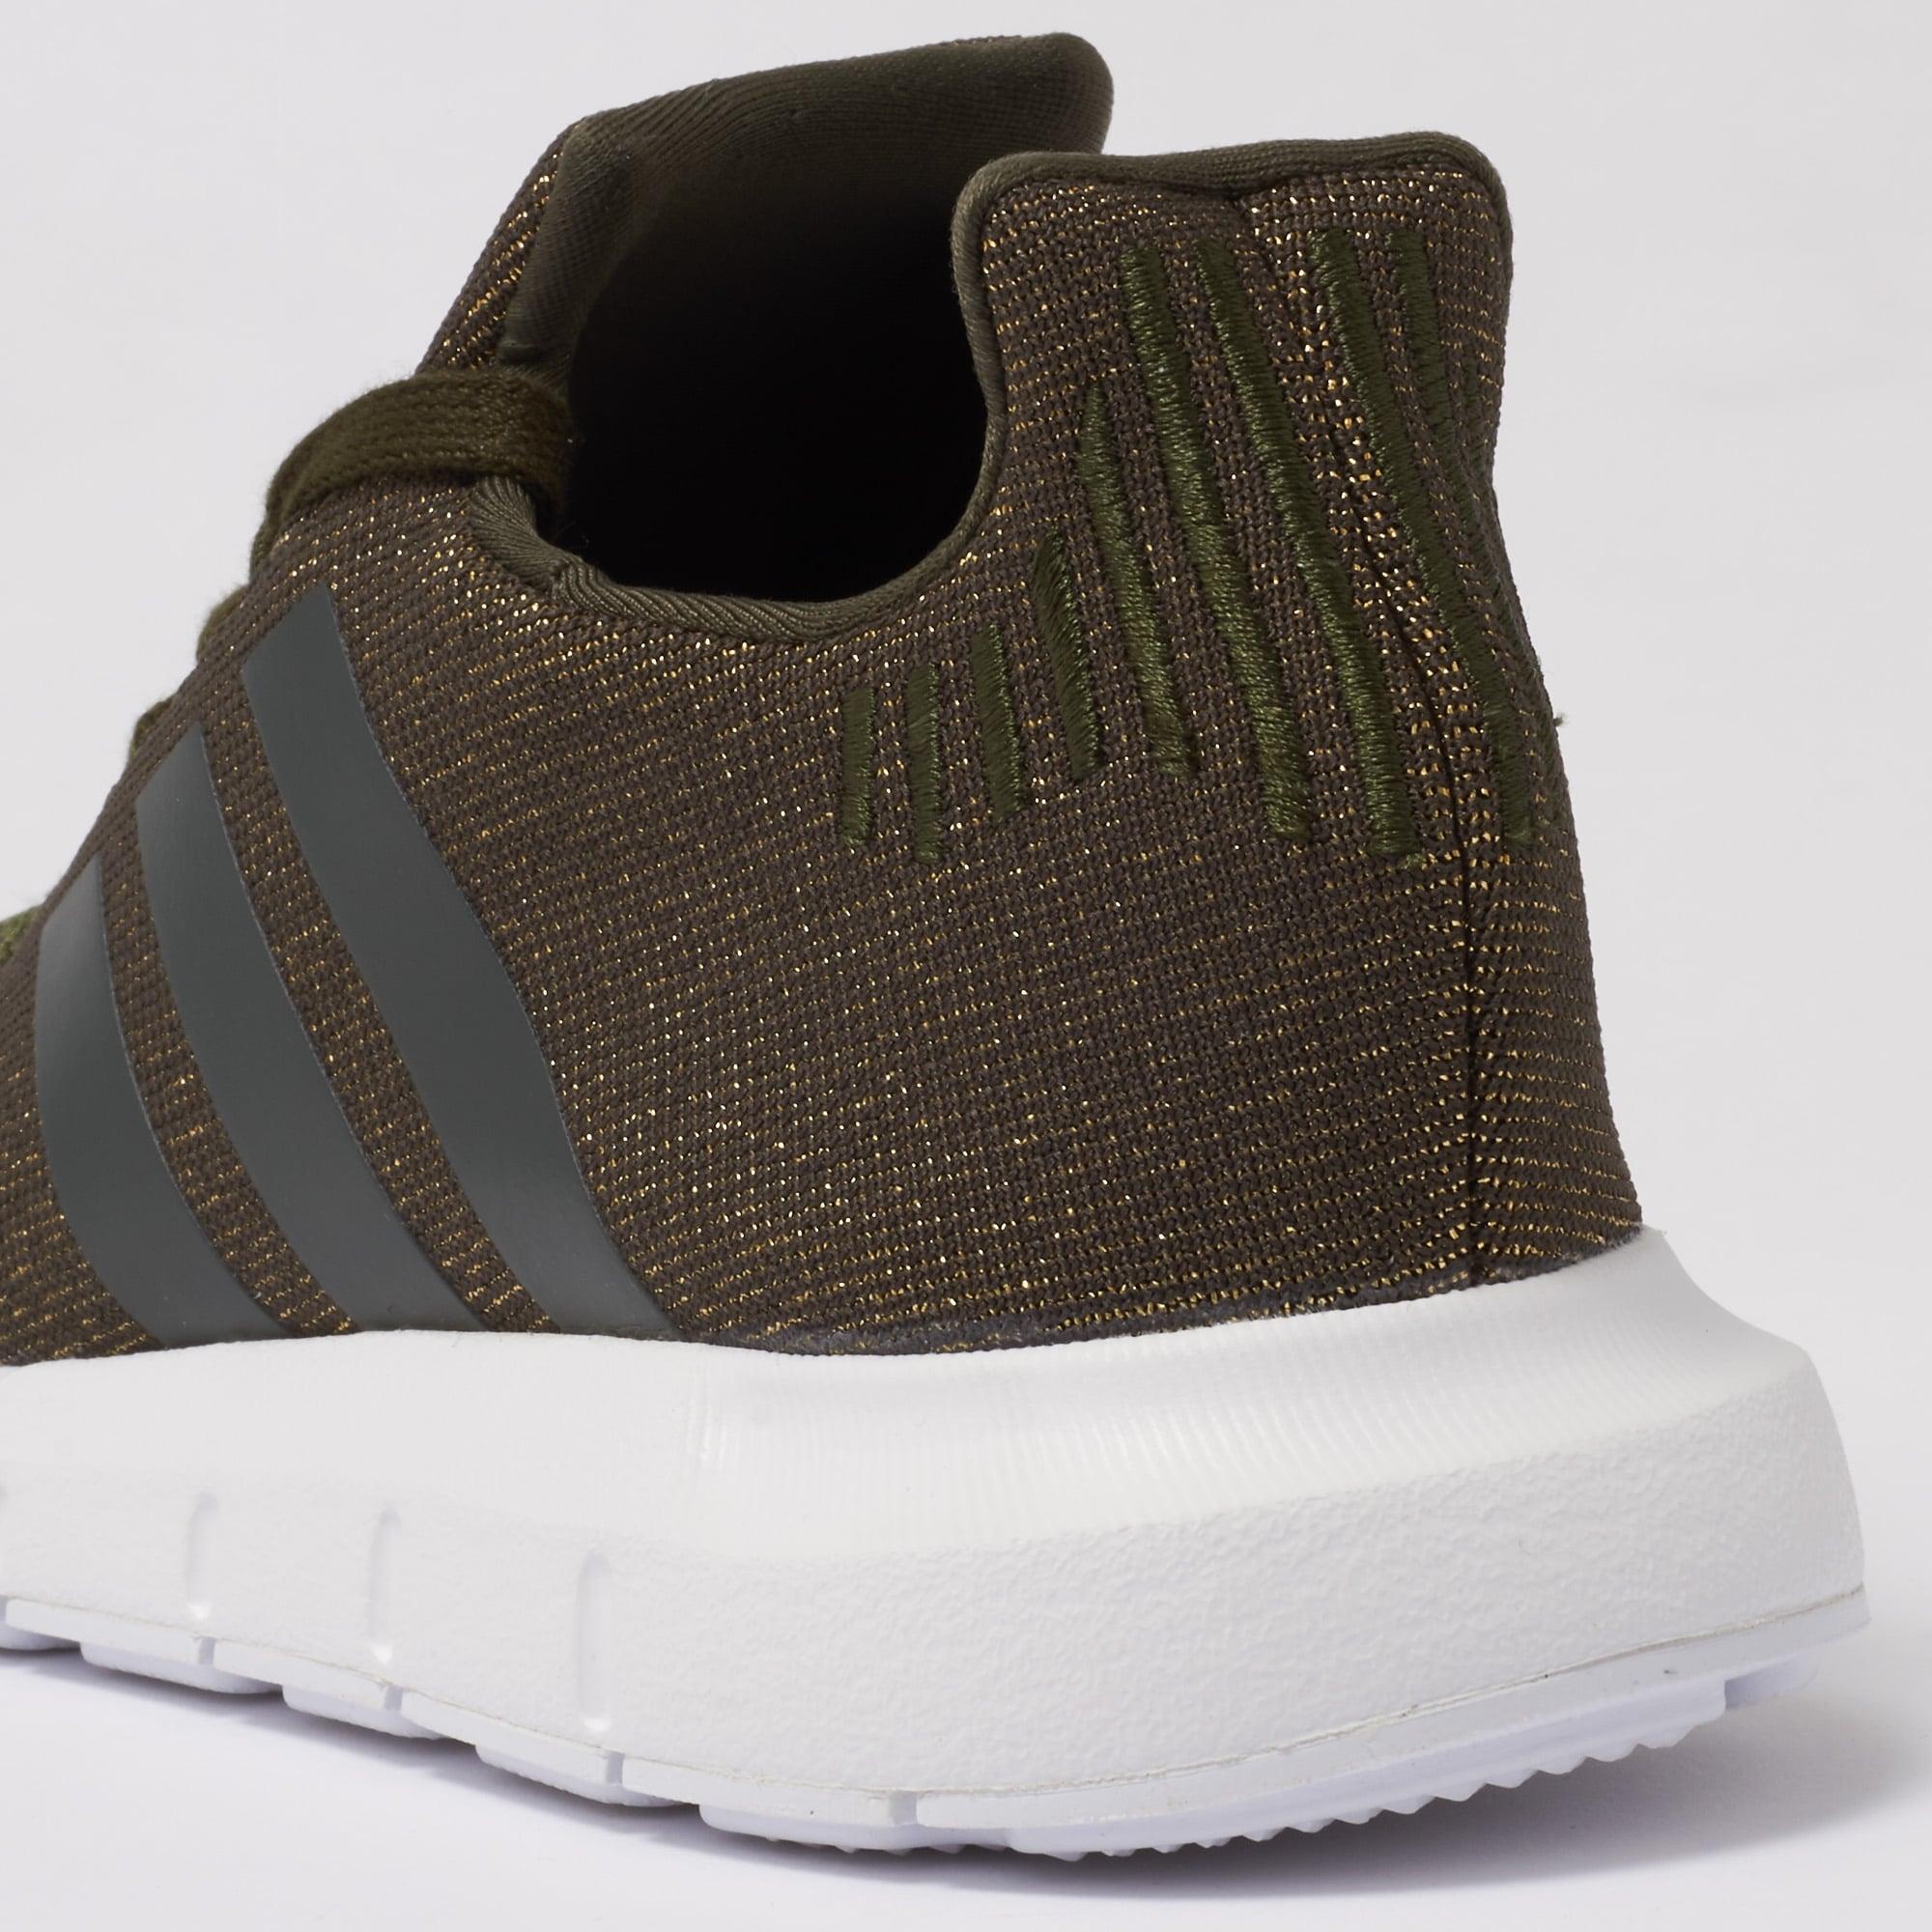 f978ed634f491 Adidas Originals Womens Swift Run Sneakers (Night Cargo) at Dandy Fellow